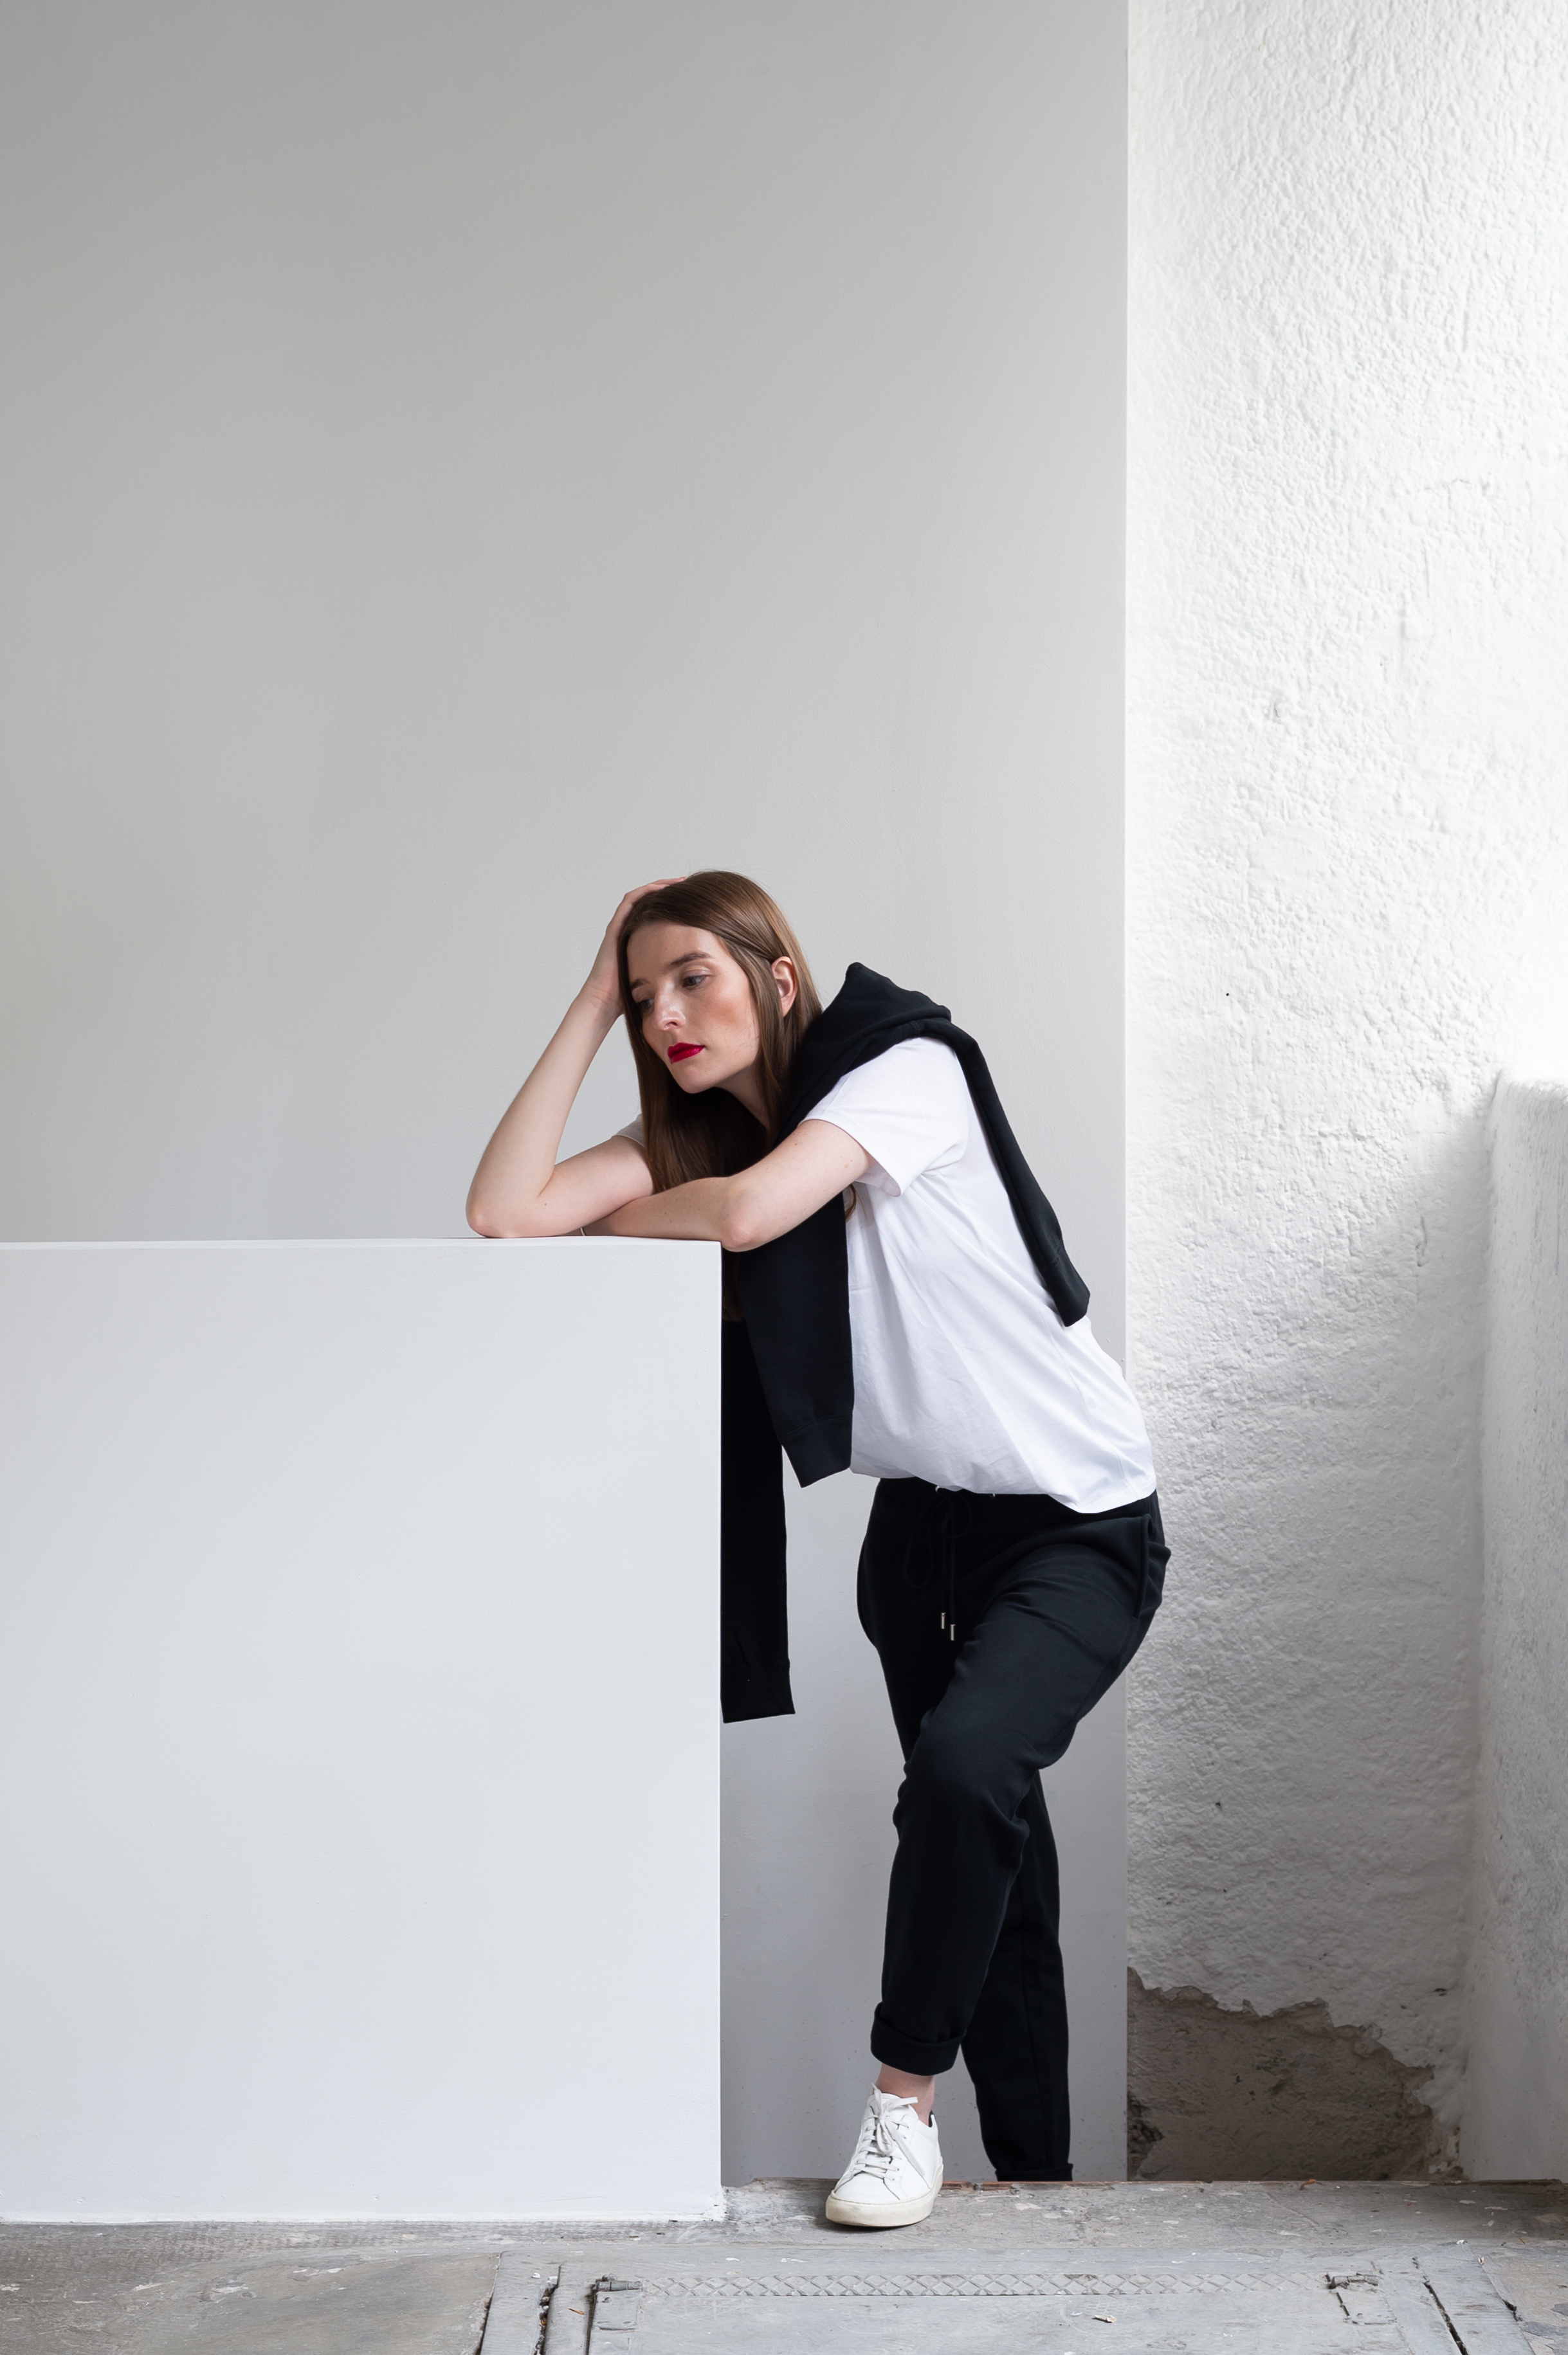 Britta_Reineke_Handvaerk_shirt_leaning_2a.jpg